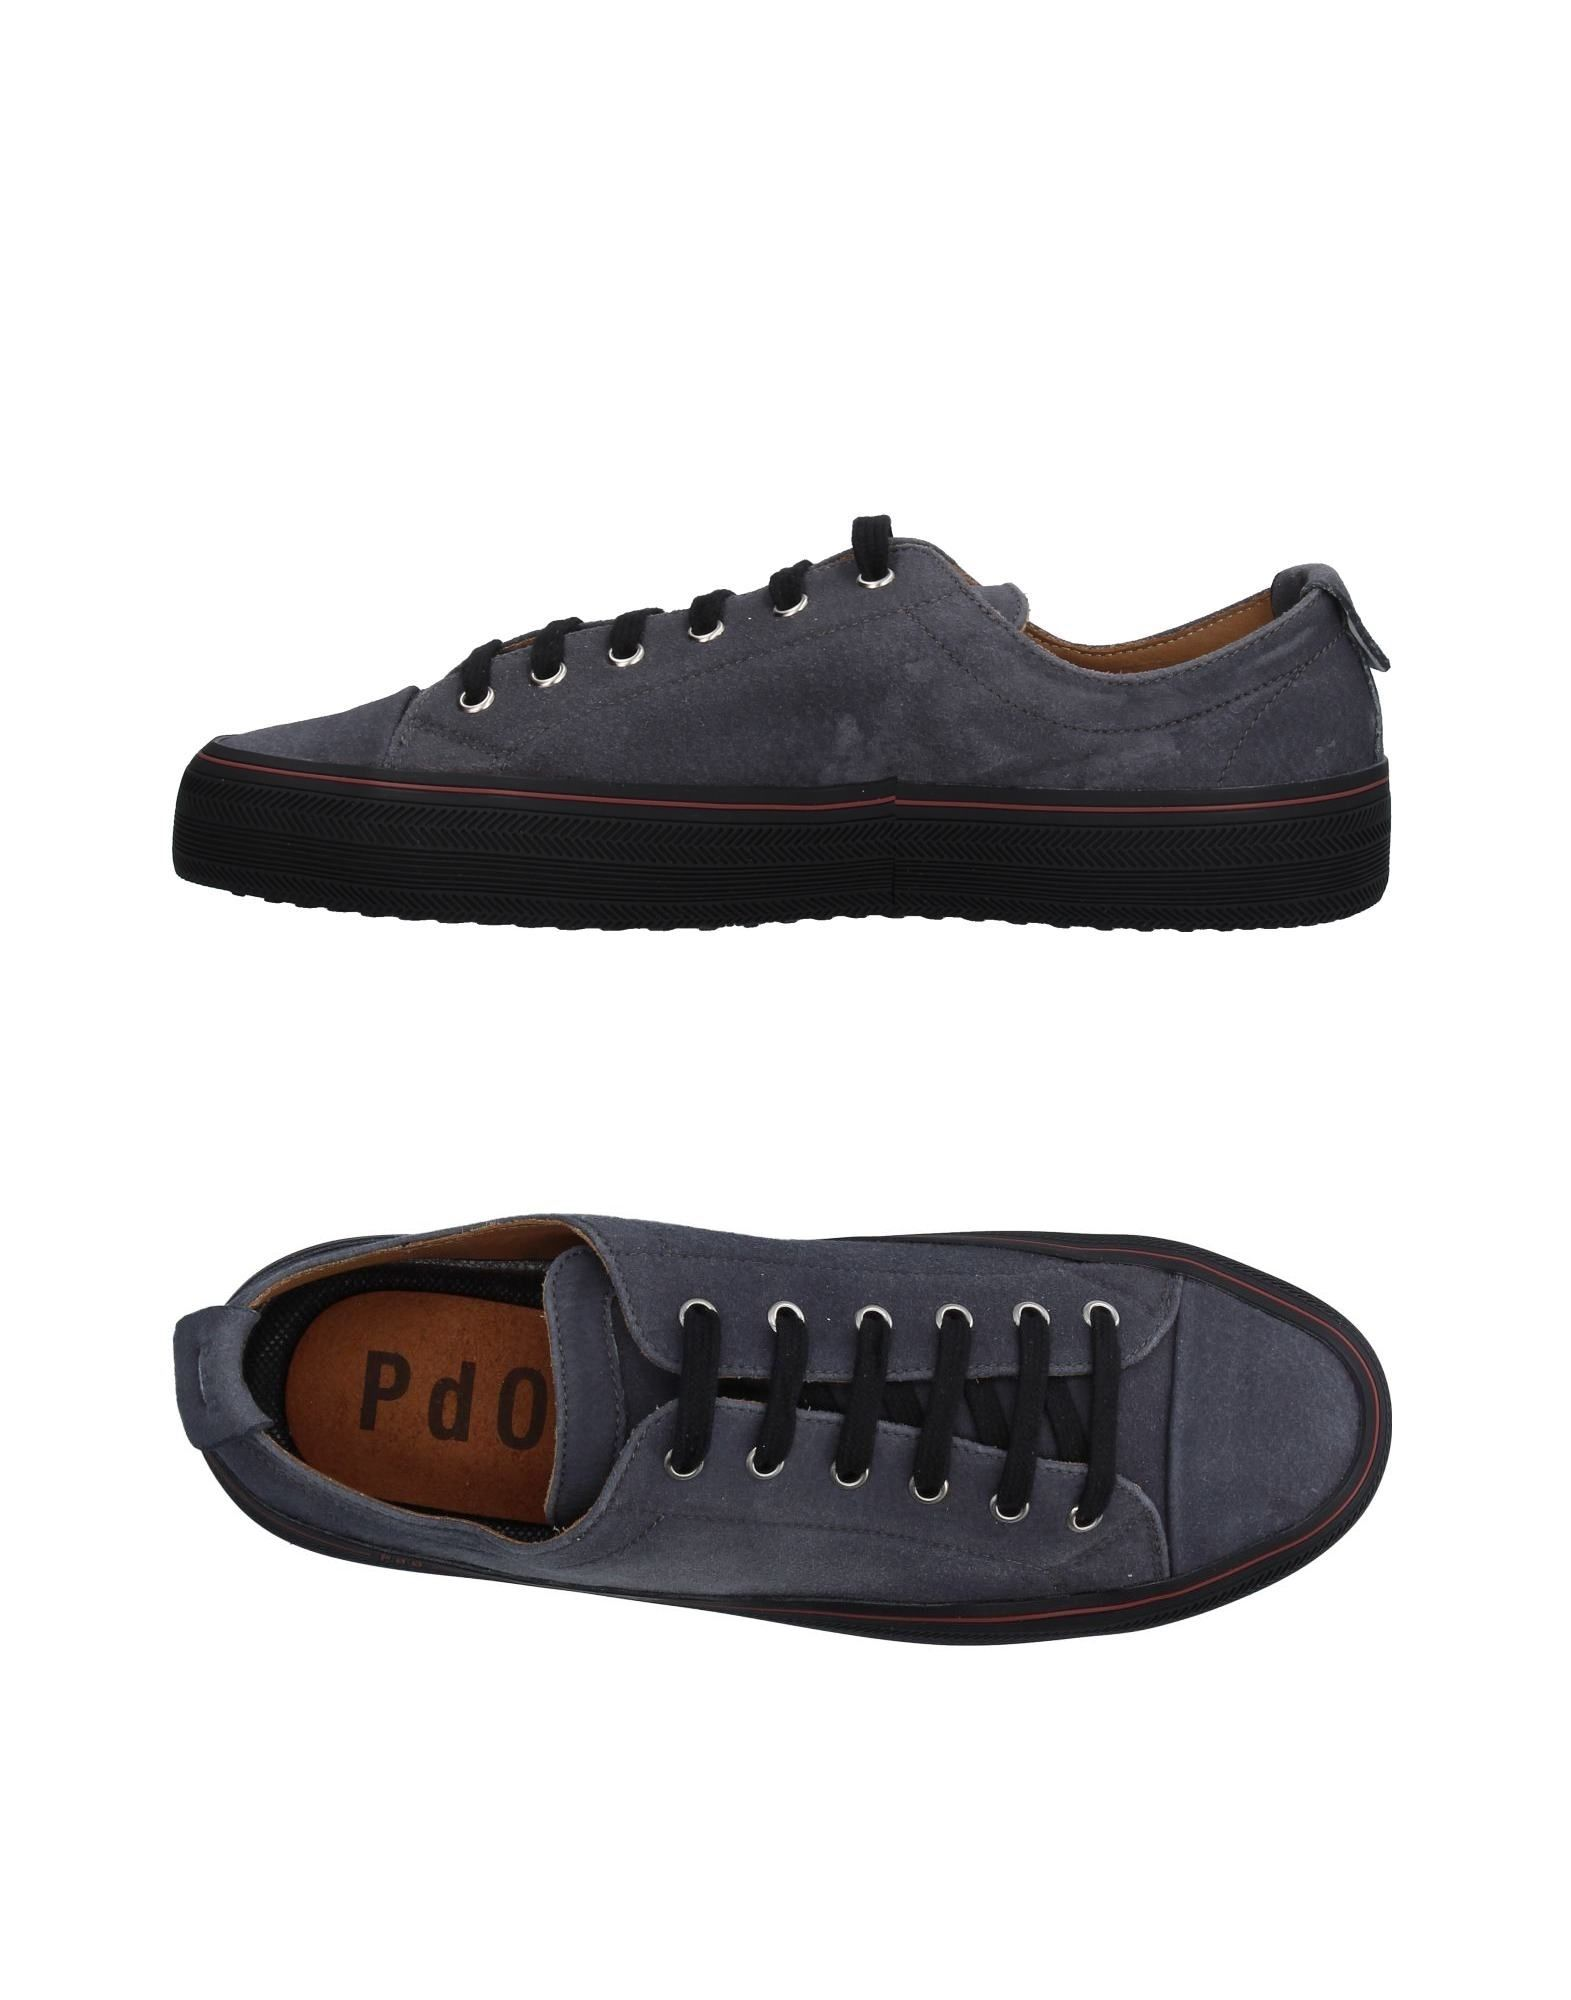 Pantofola D'oro Sneakers Herren  11222646LK Gute Qualität beliebte Schuhe